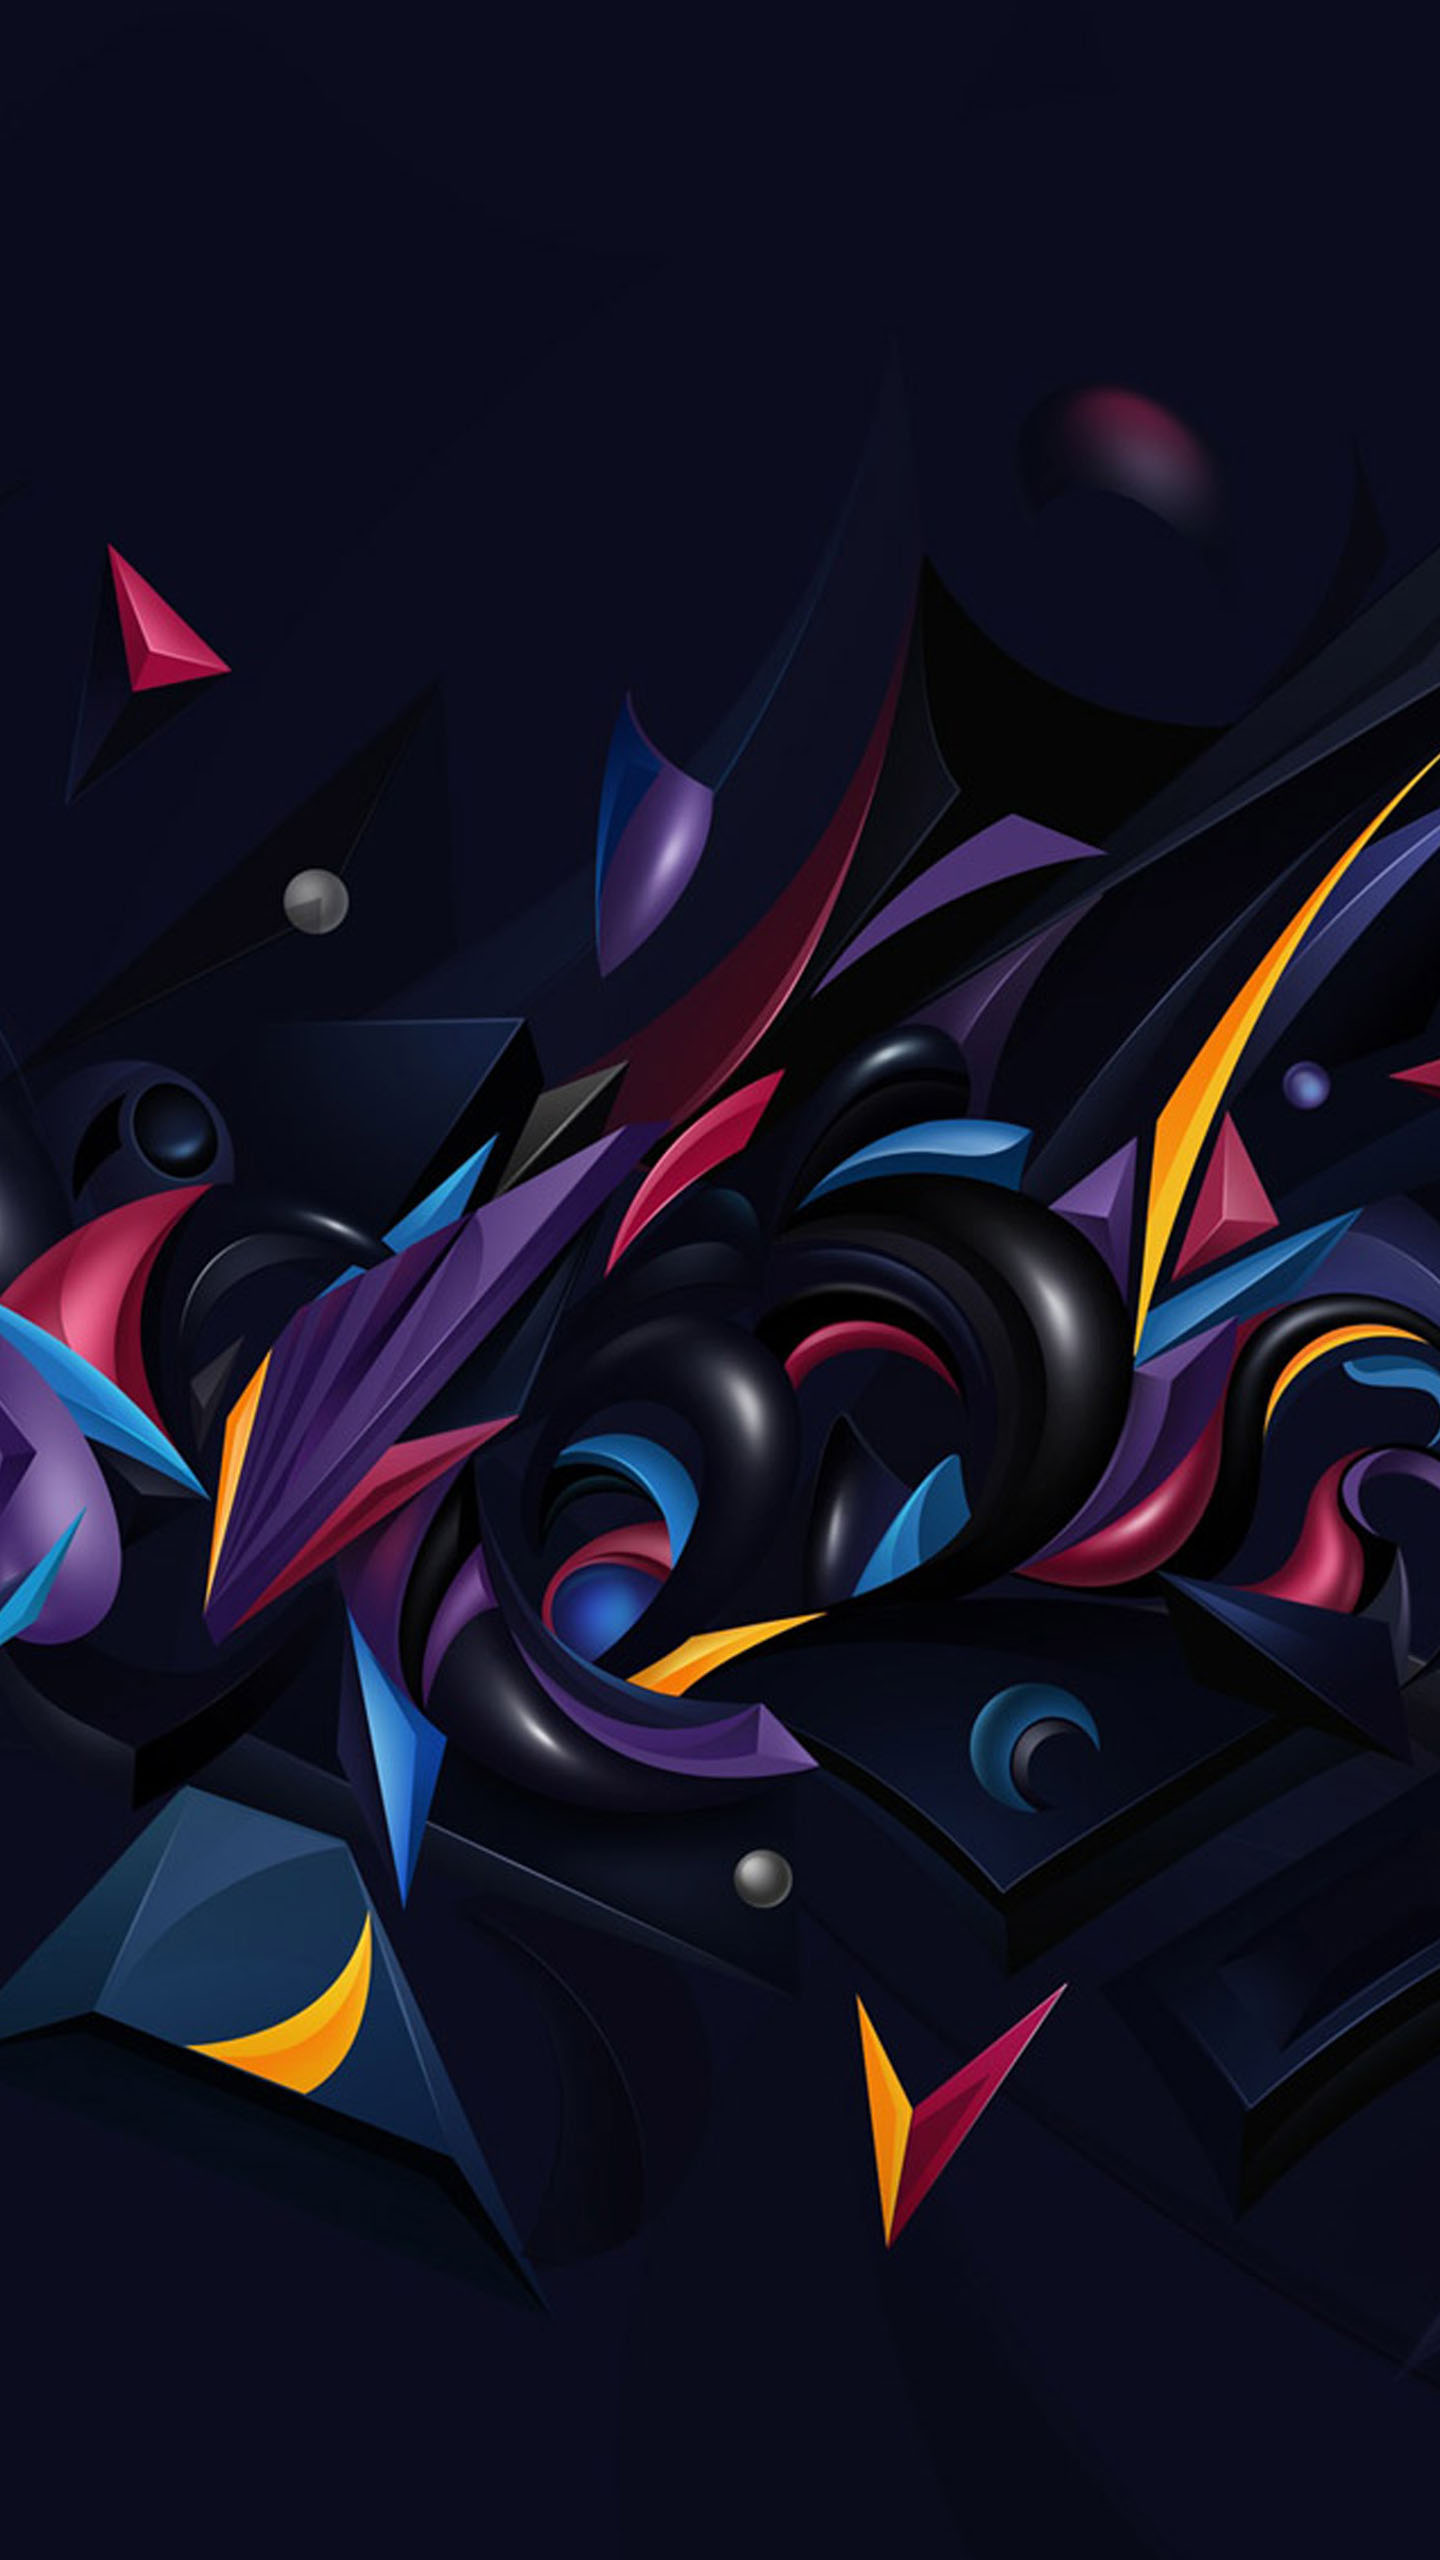 3D Samsung Galaxy S5 Wallpapers 03 Samsung Galaxy S5 Wallpapers 1440x2560